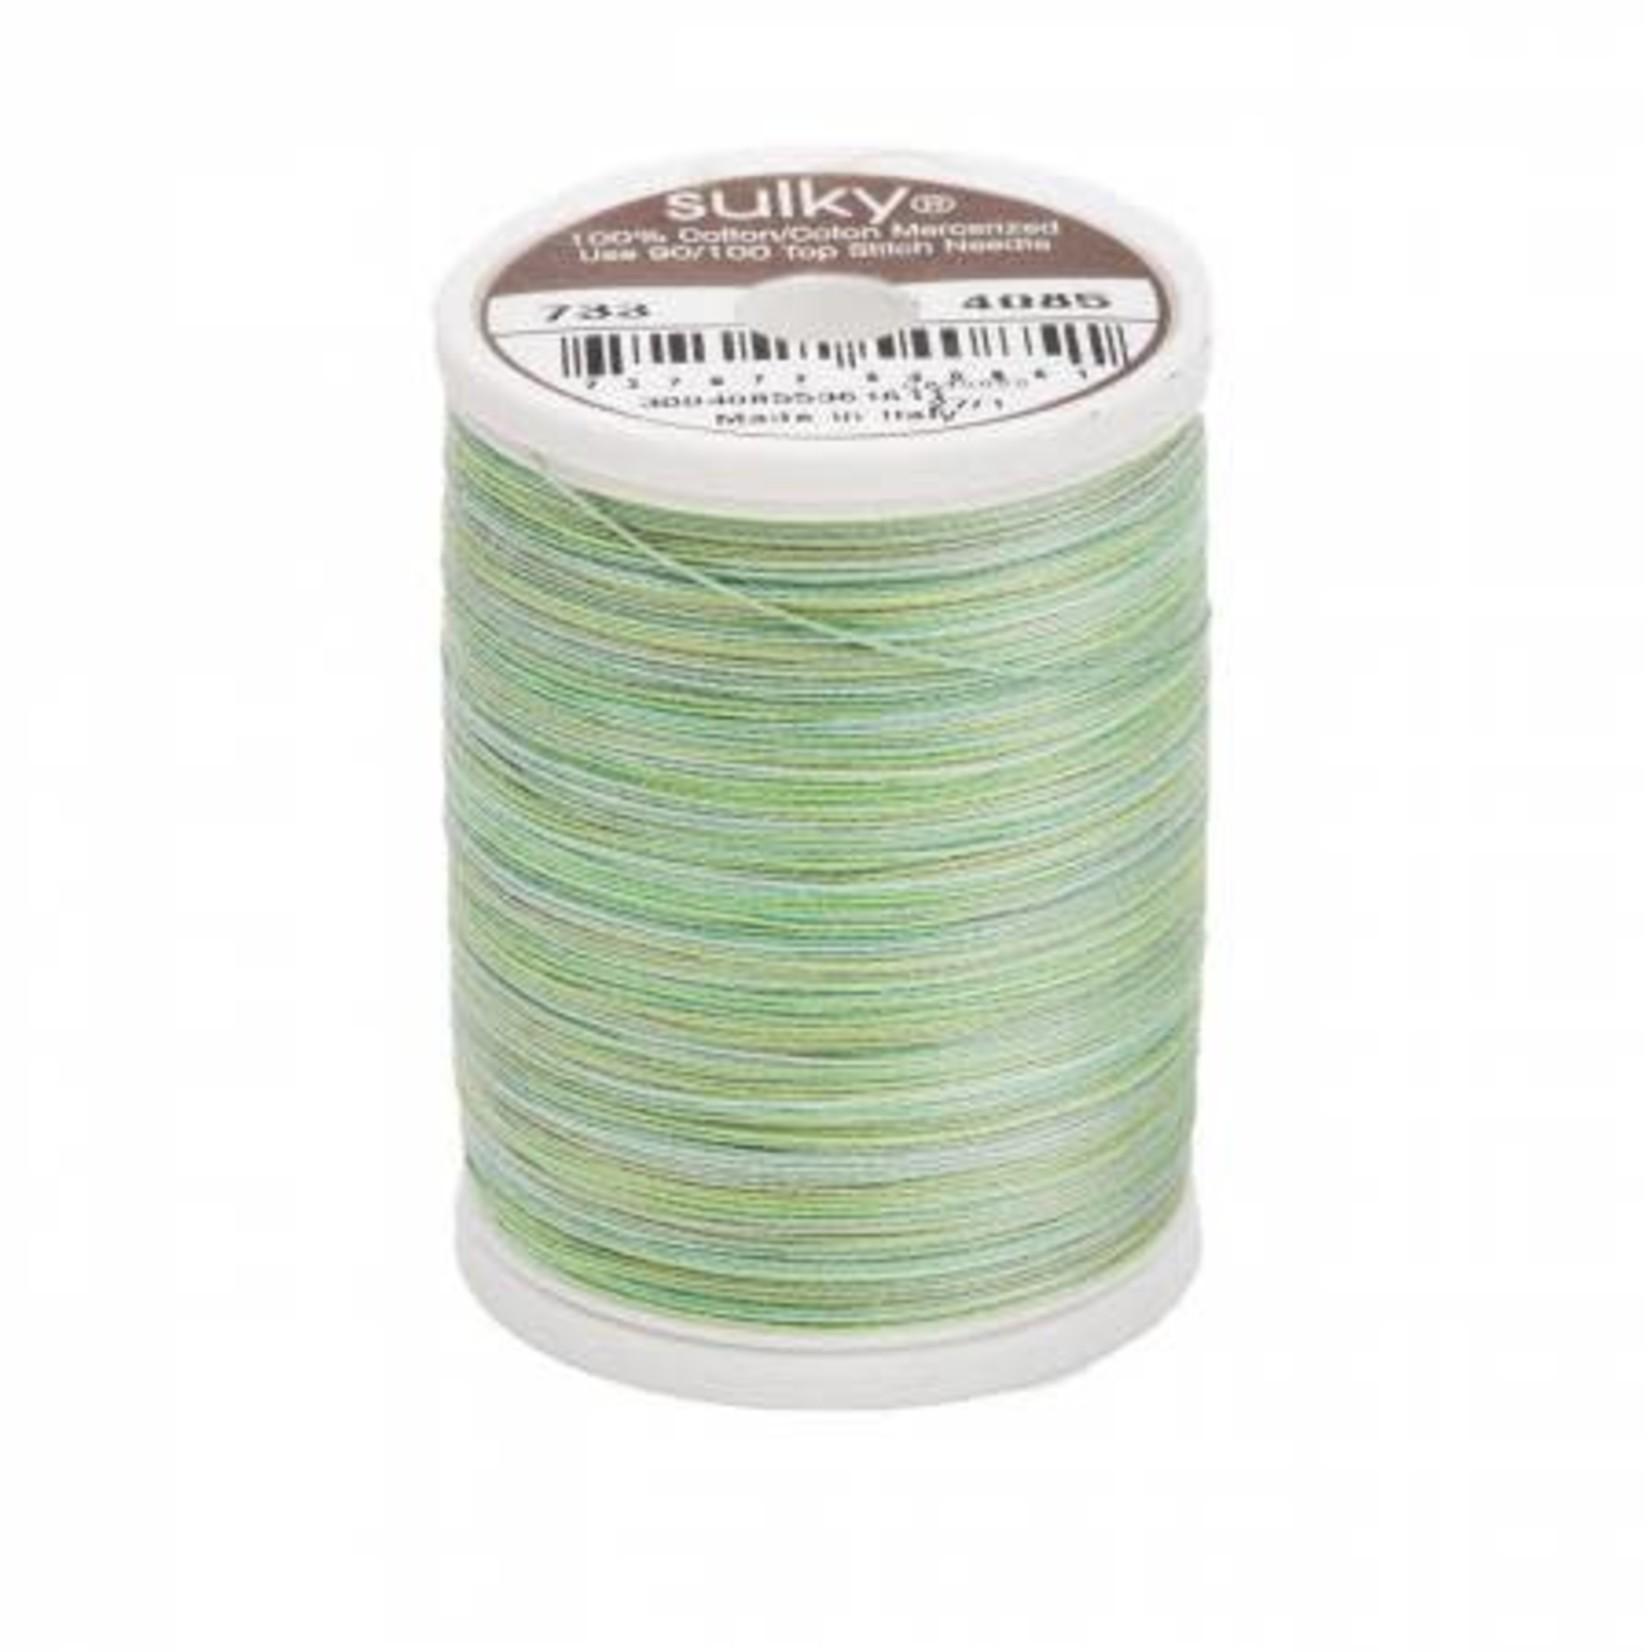 Sulky Blendables Cotton Thread 2-ply 30wt 400d 500yds Green Tea